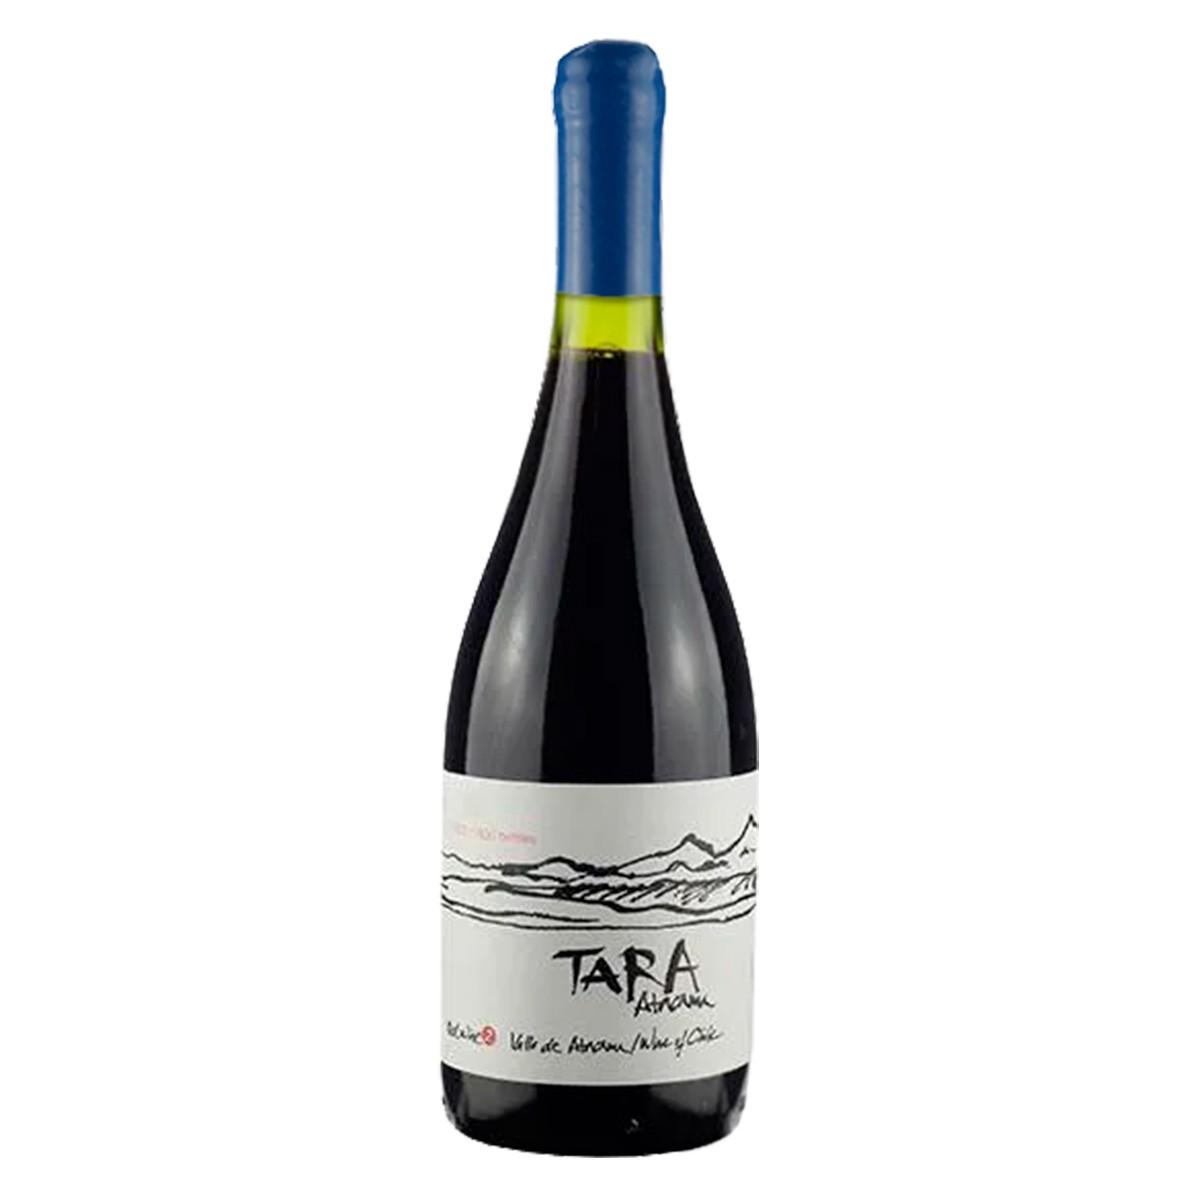 Vinho Tinto Tara Atacama Syrah 2015